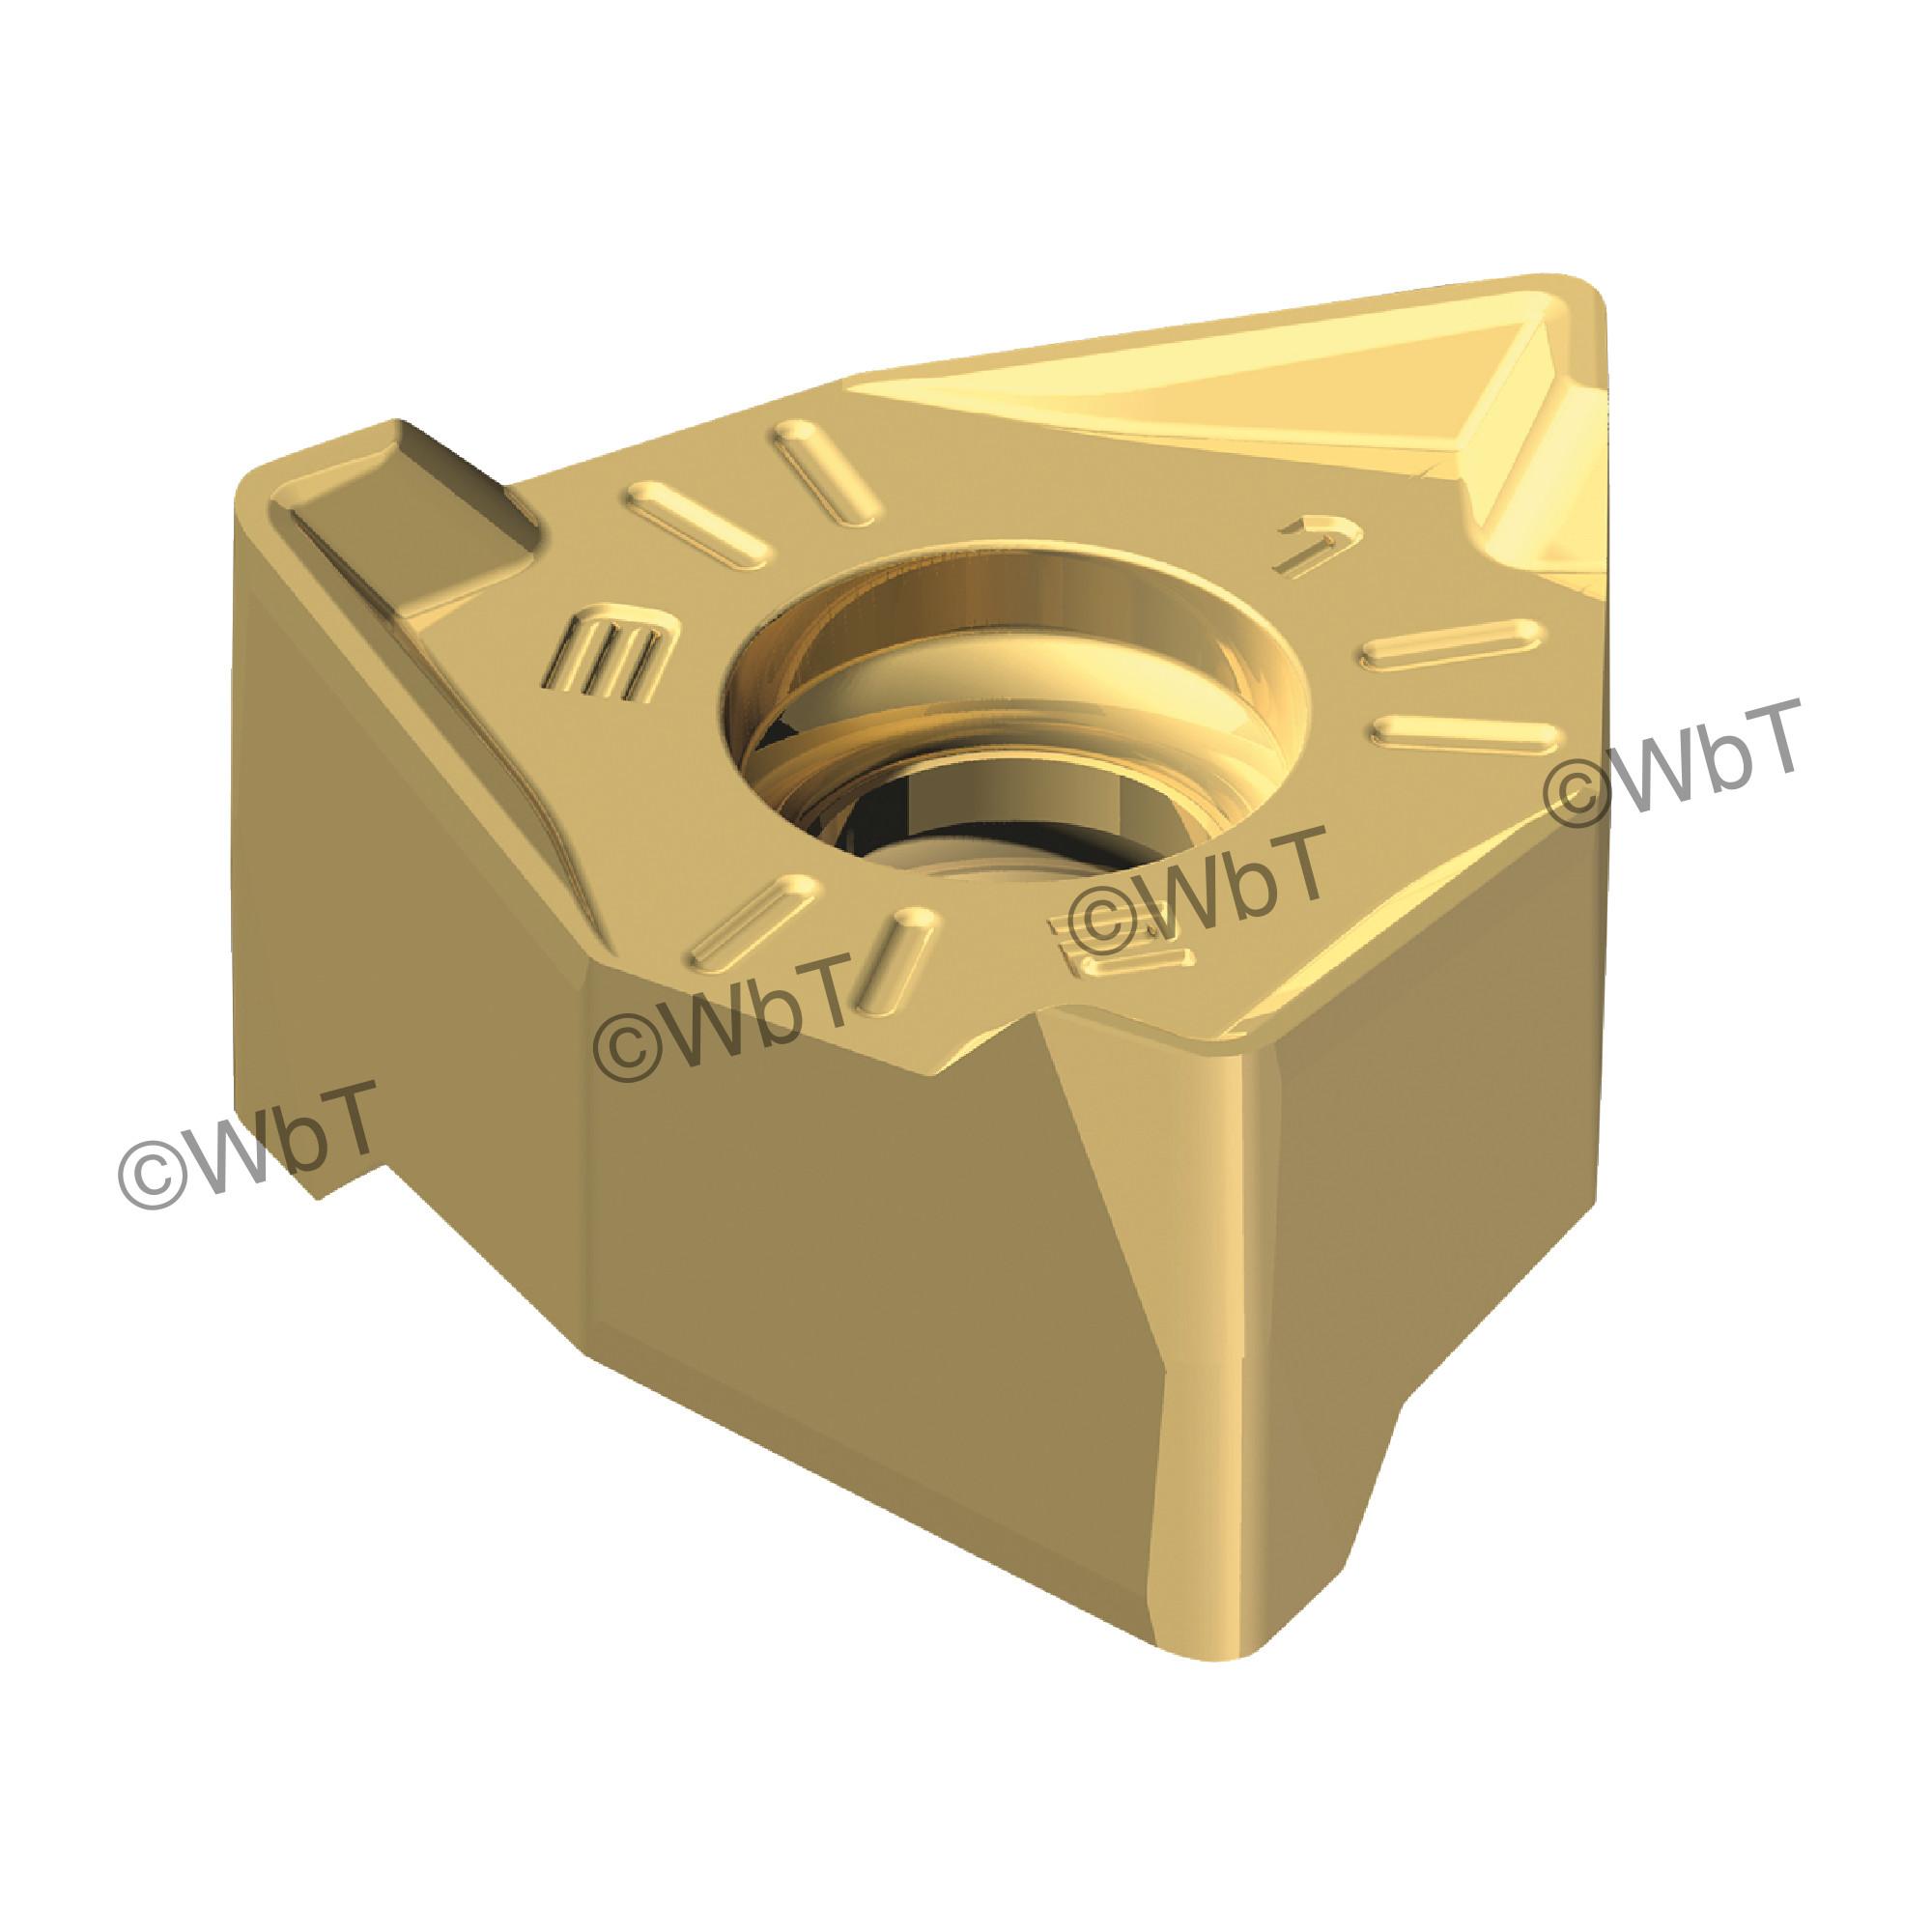 AKUMA - XNEX442R-R1 CM30P Special Shape / INDEXABLE Carbide MILLING INSERT